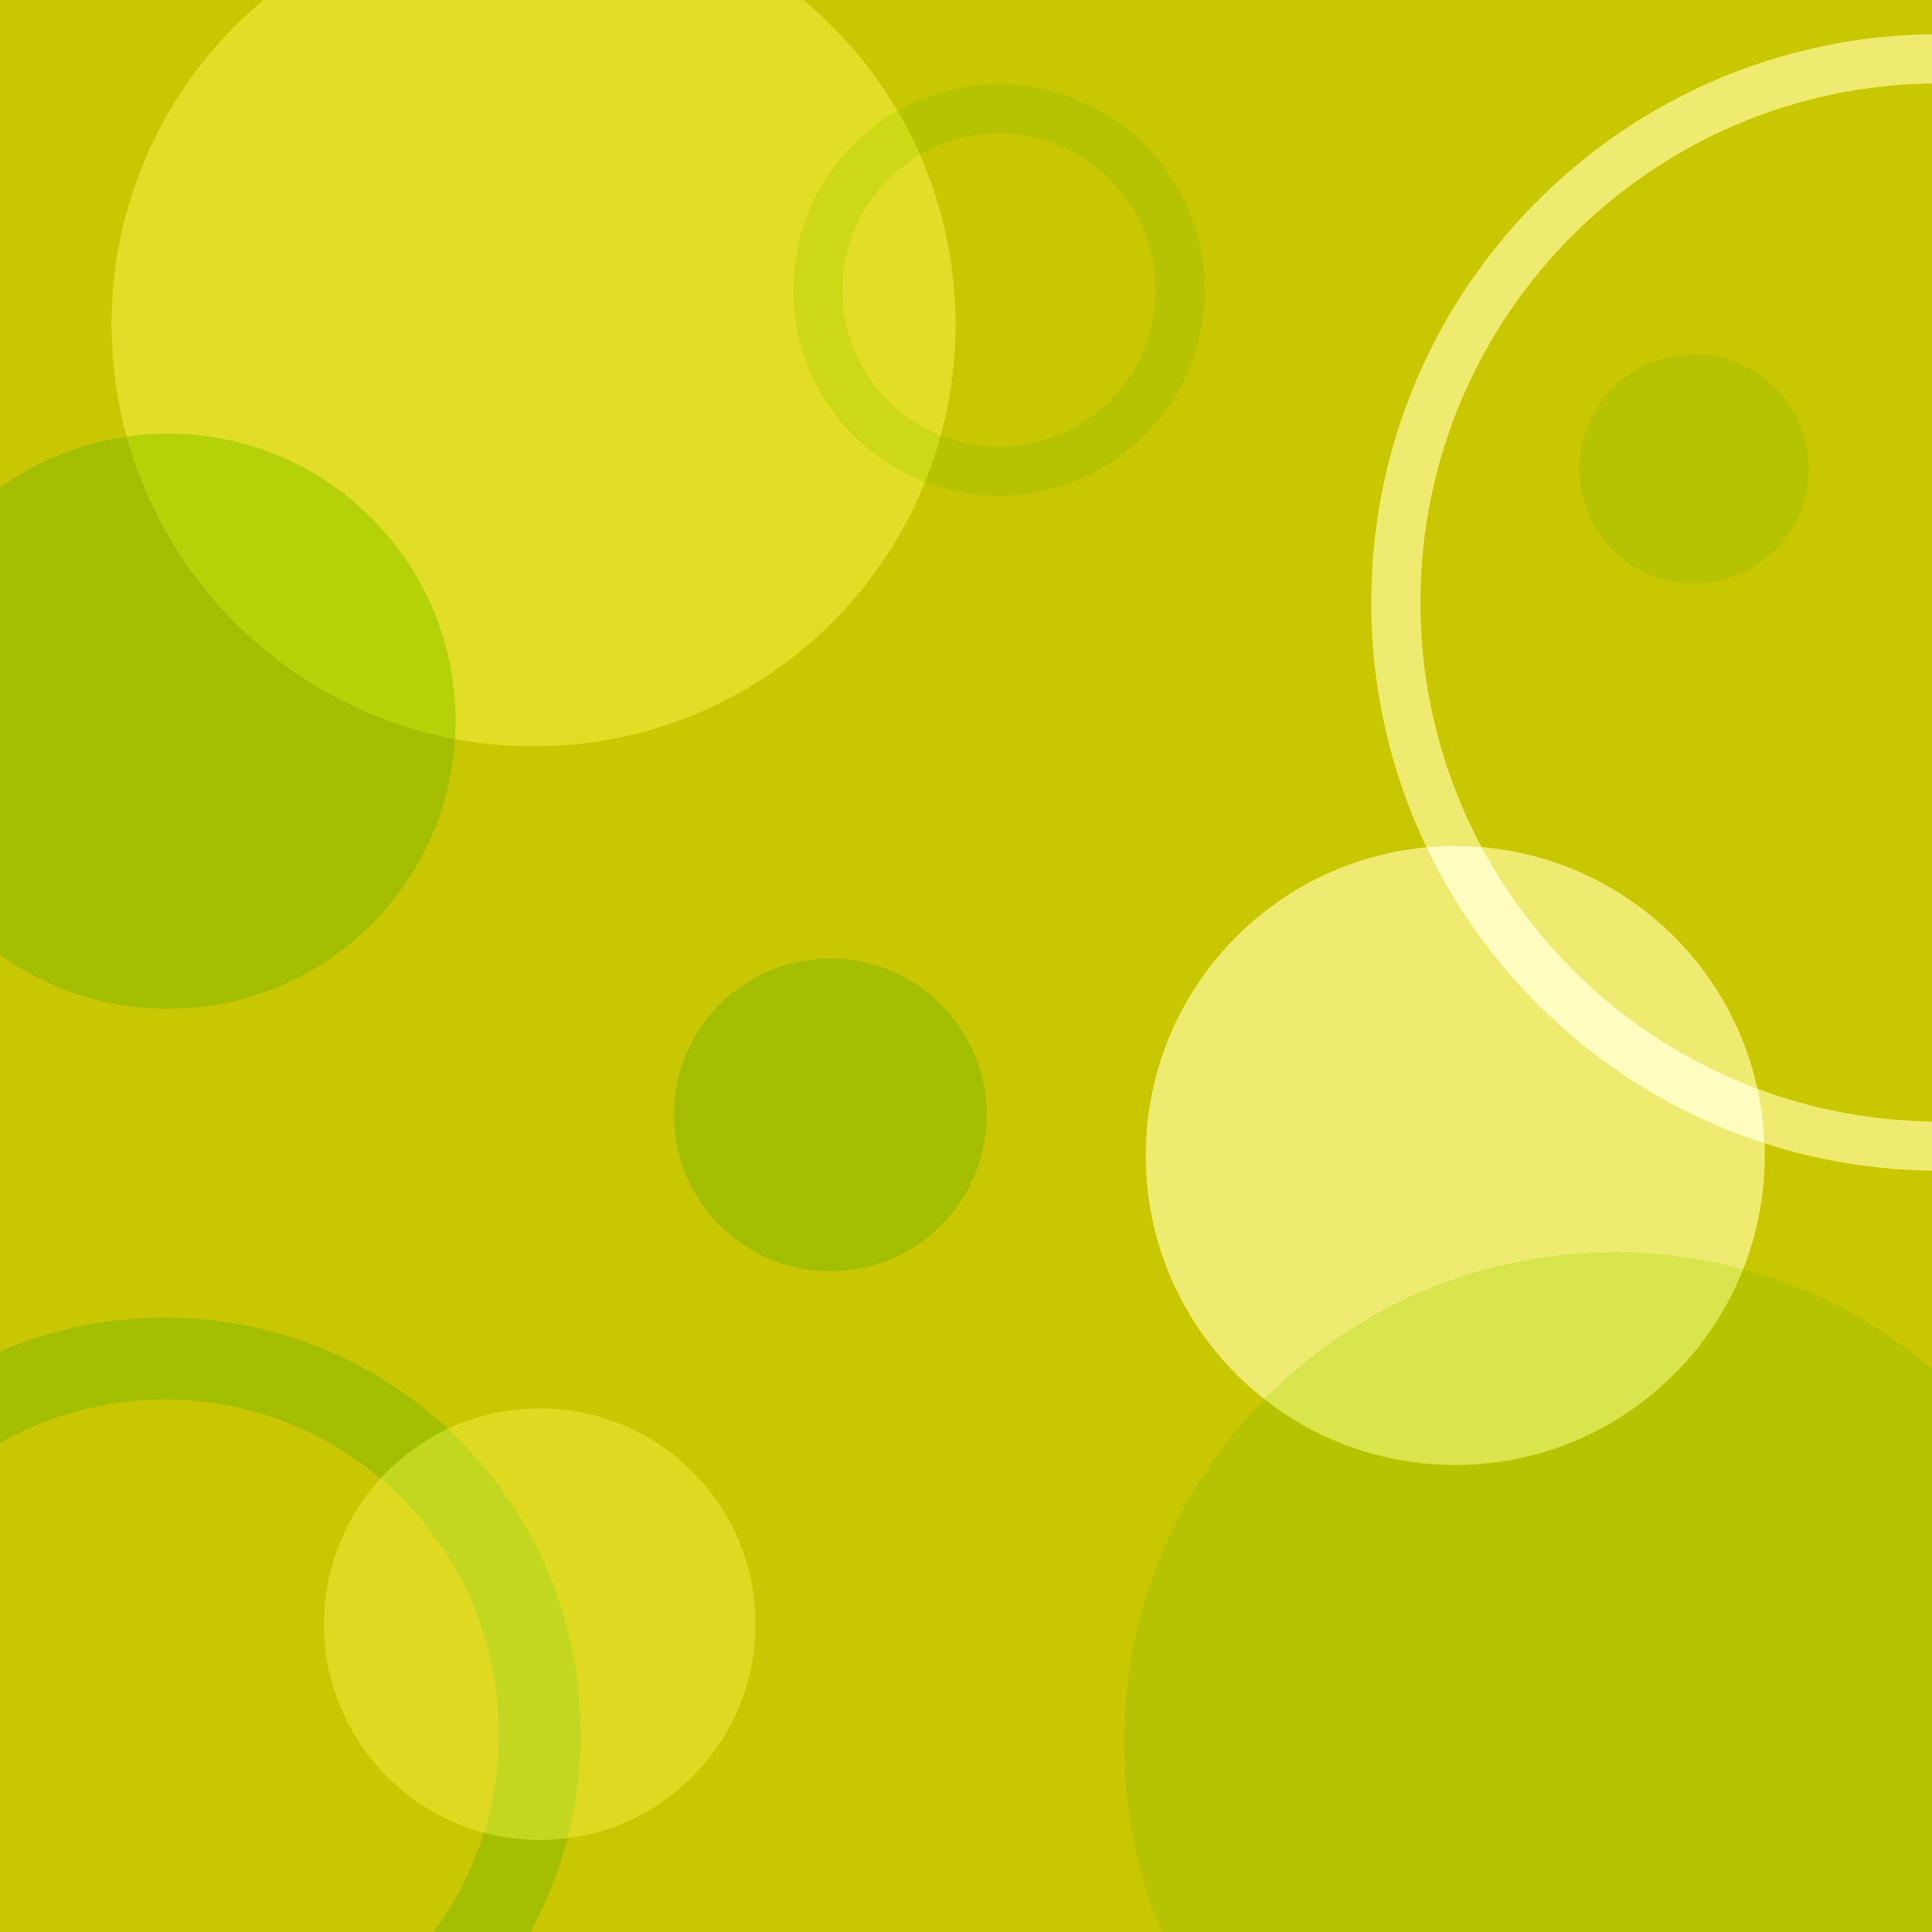 Yellow Circle Pattern Clip Art